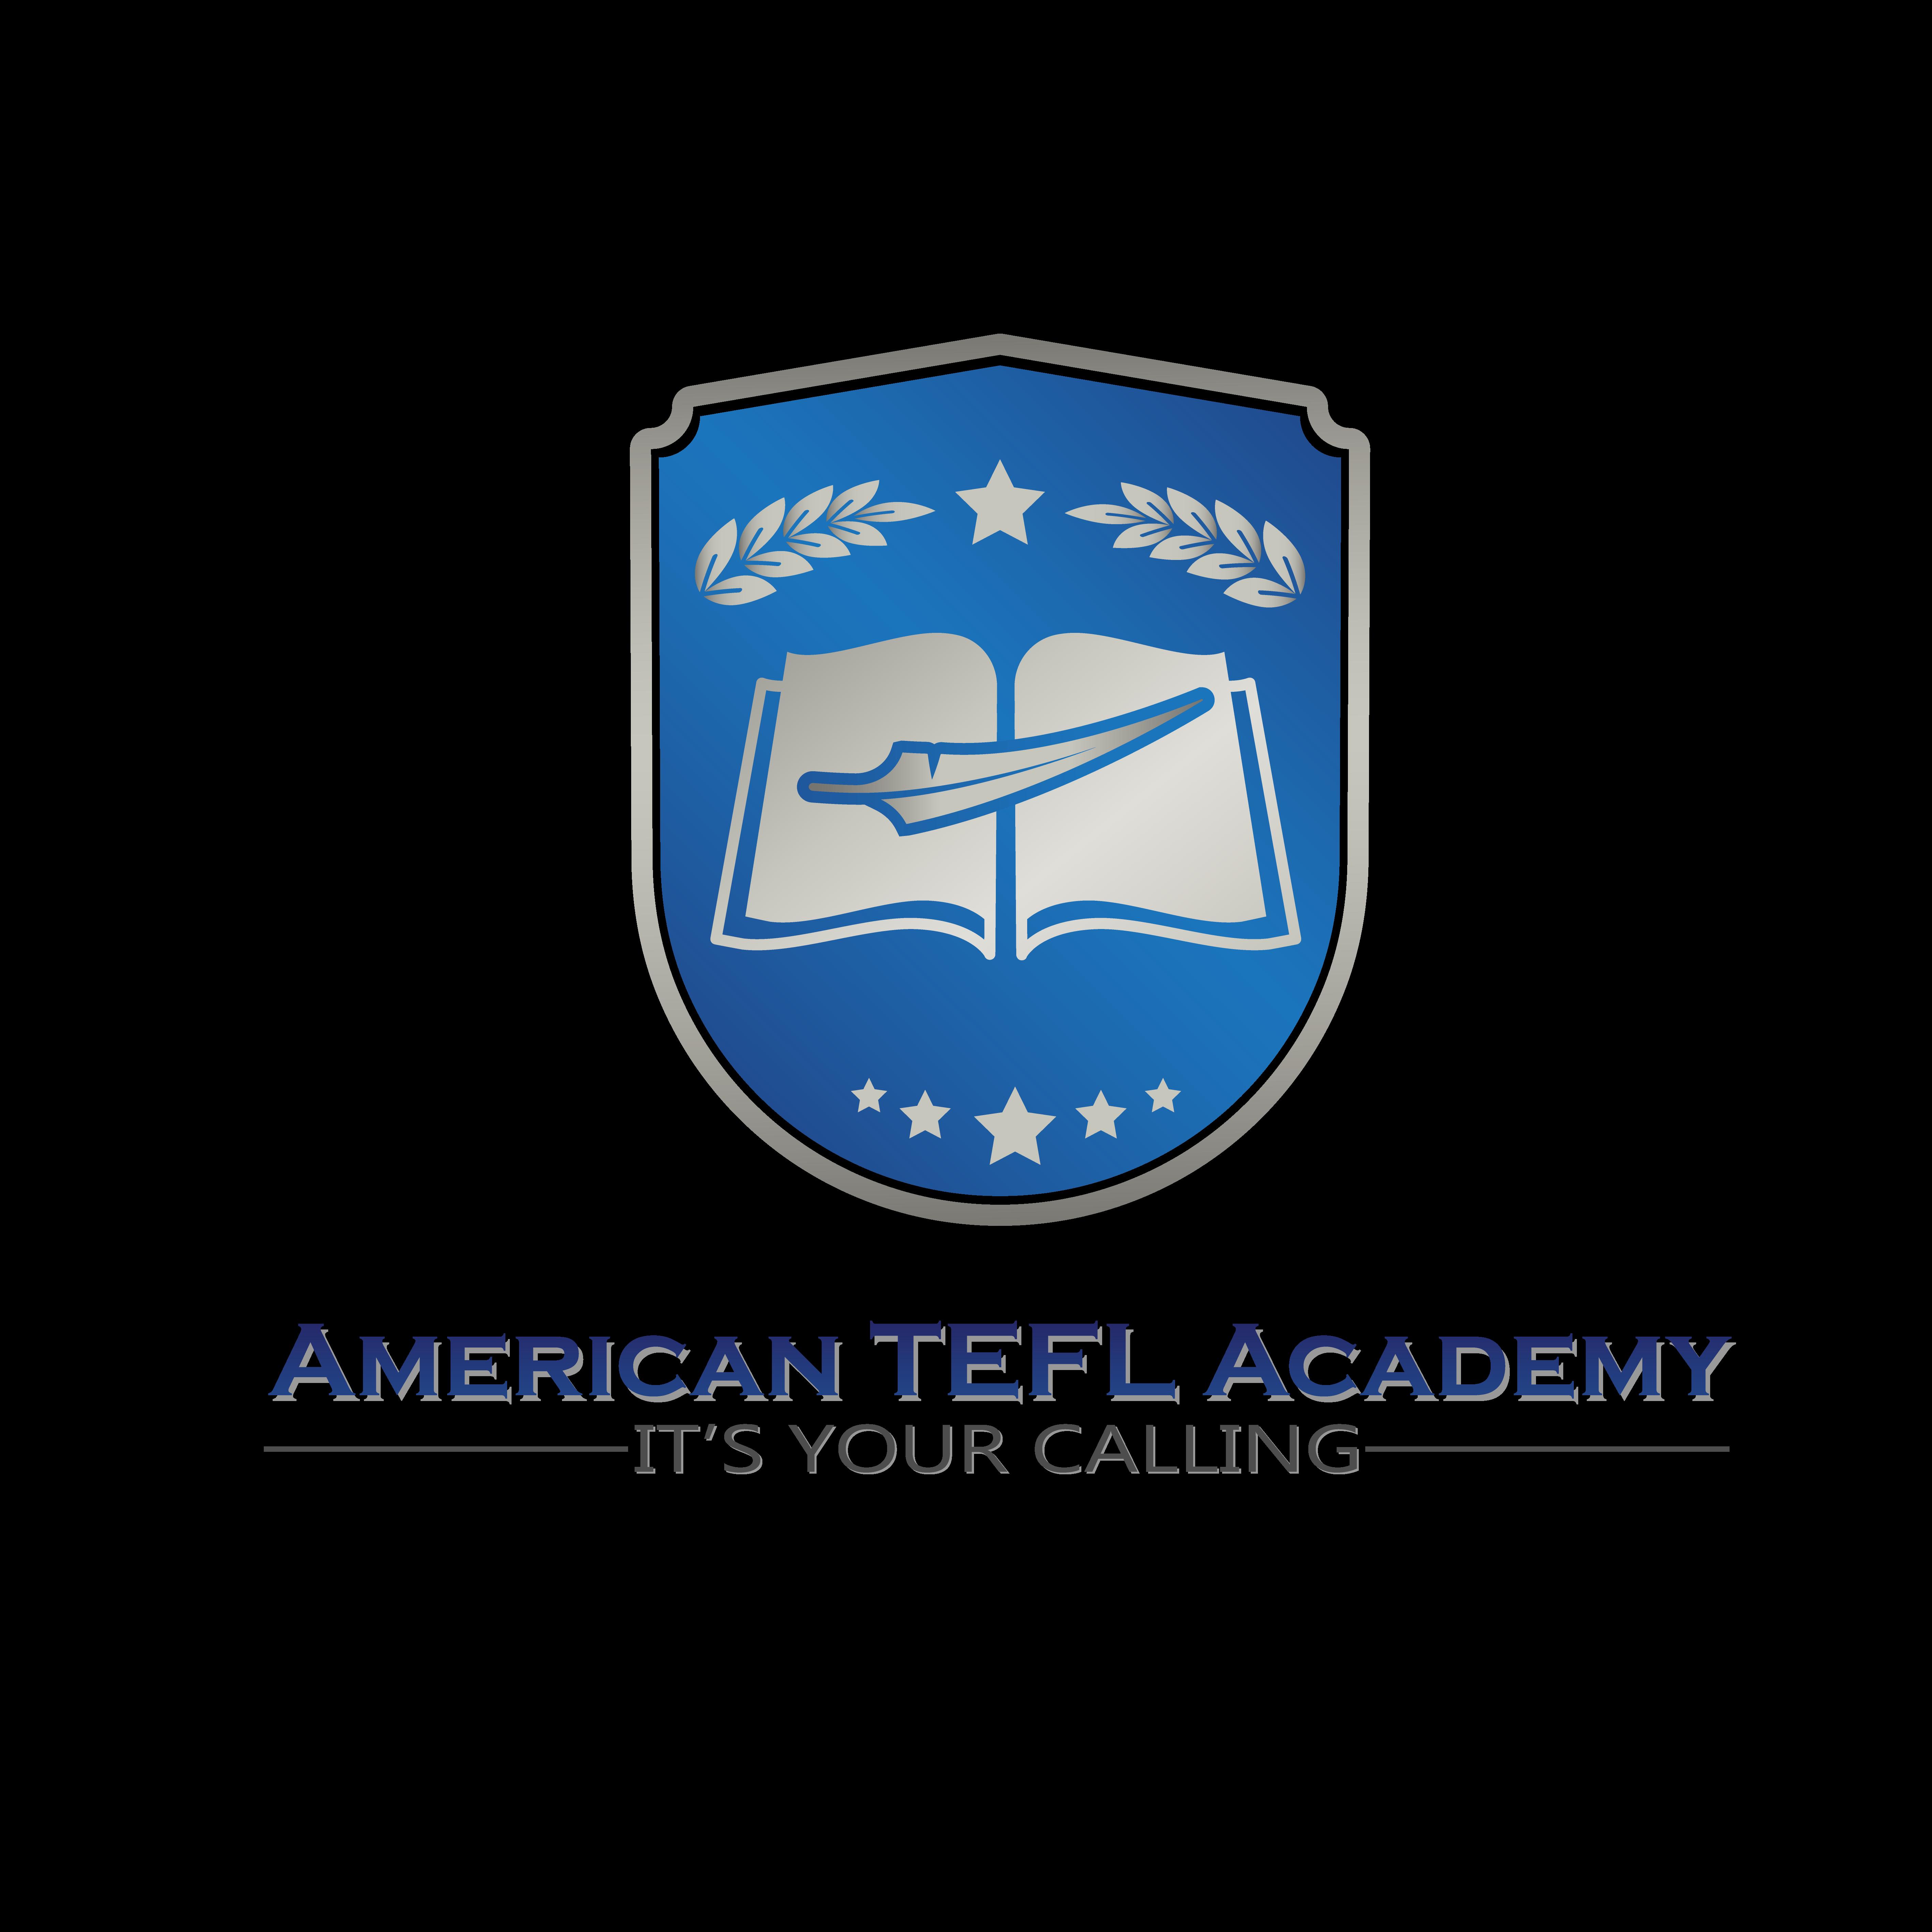 American TEFL Academy